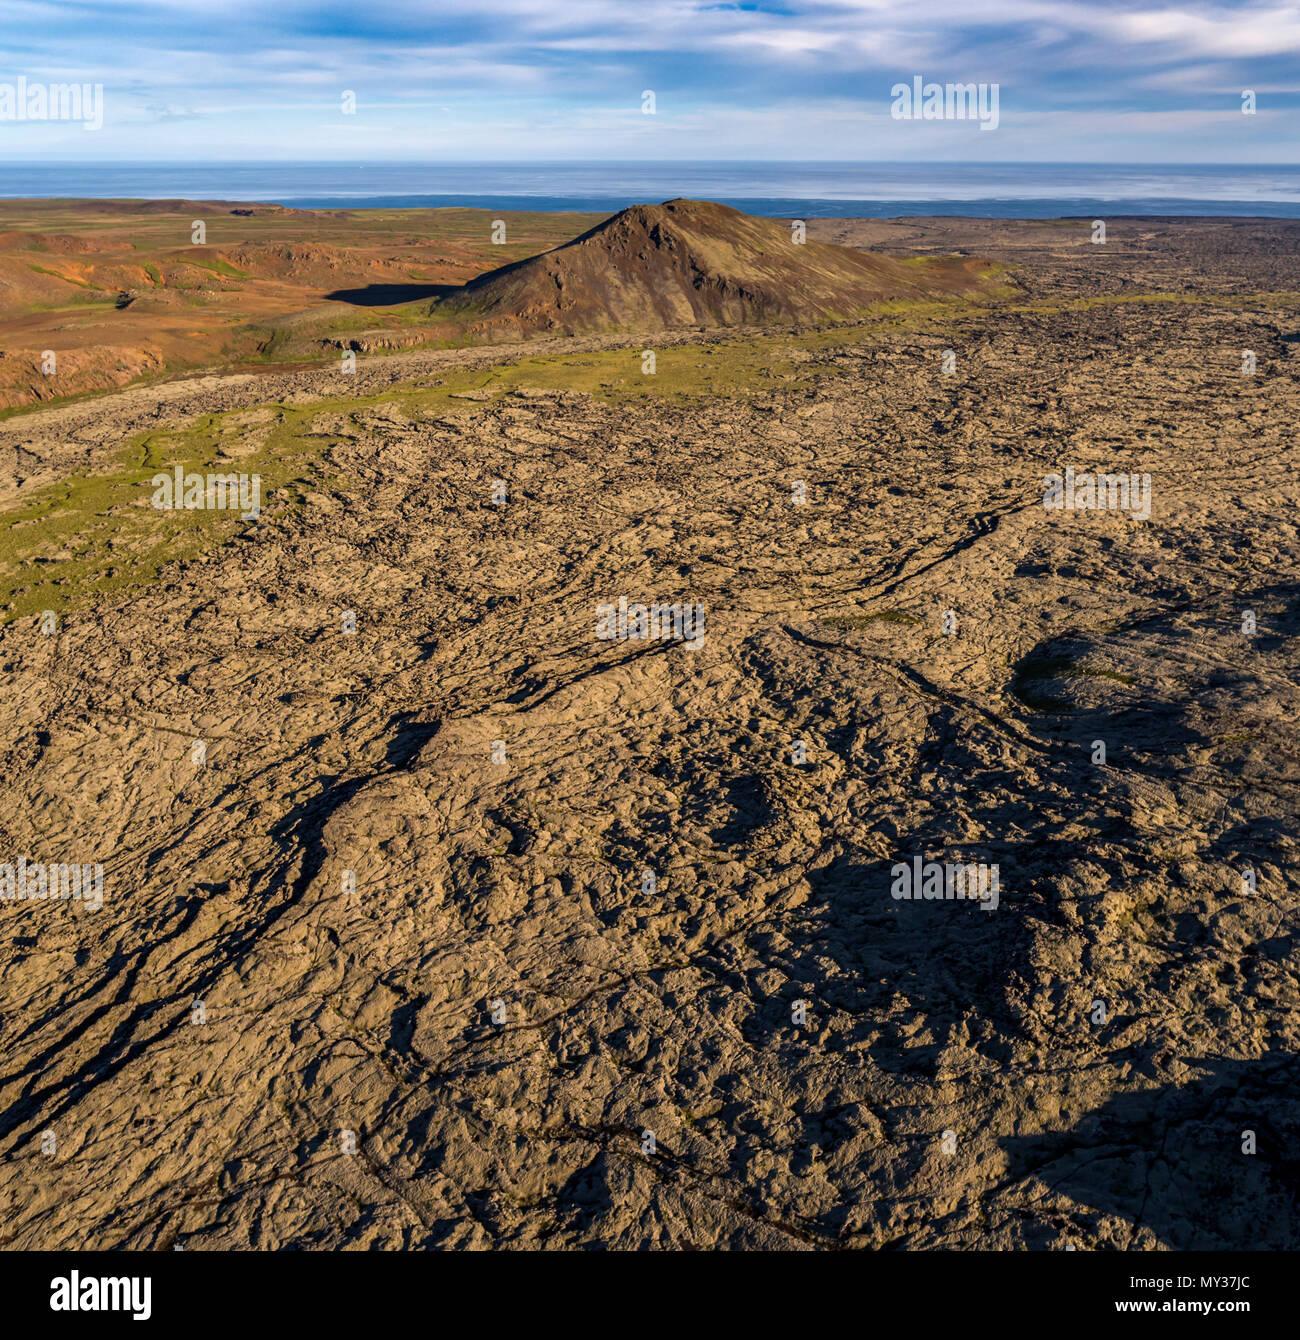 Lava fields-Nupshlidarhals, Reykjanes Peninsula, Iceland - Stock Image